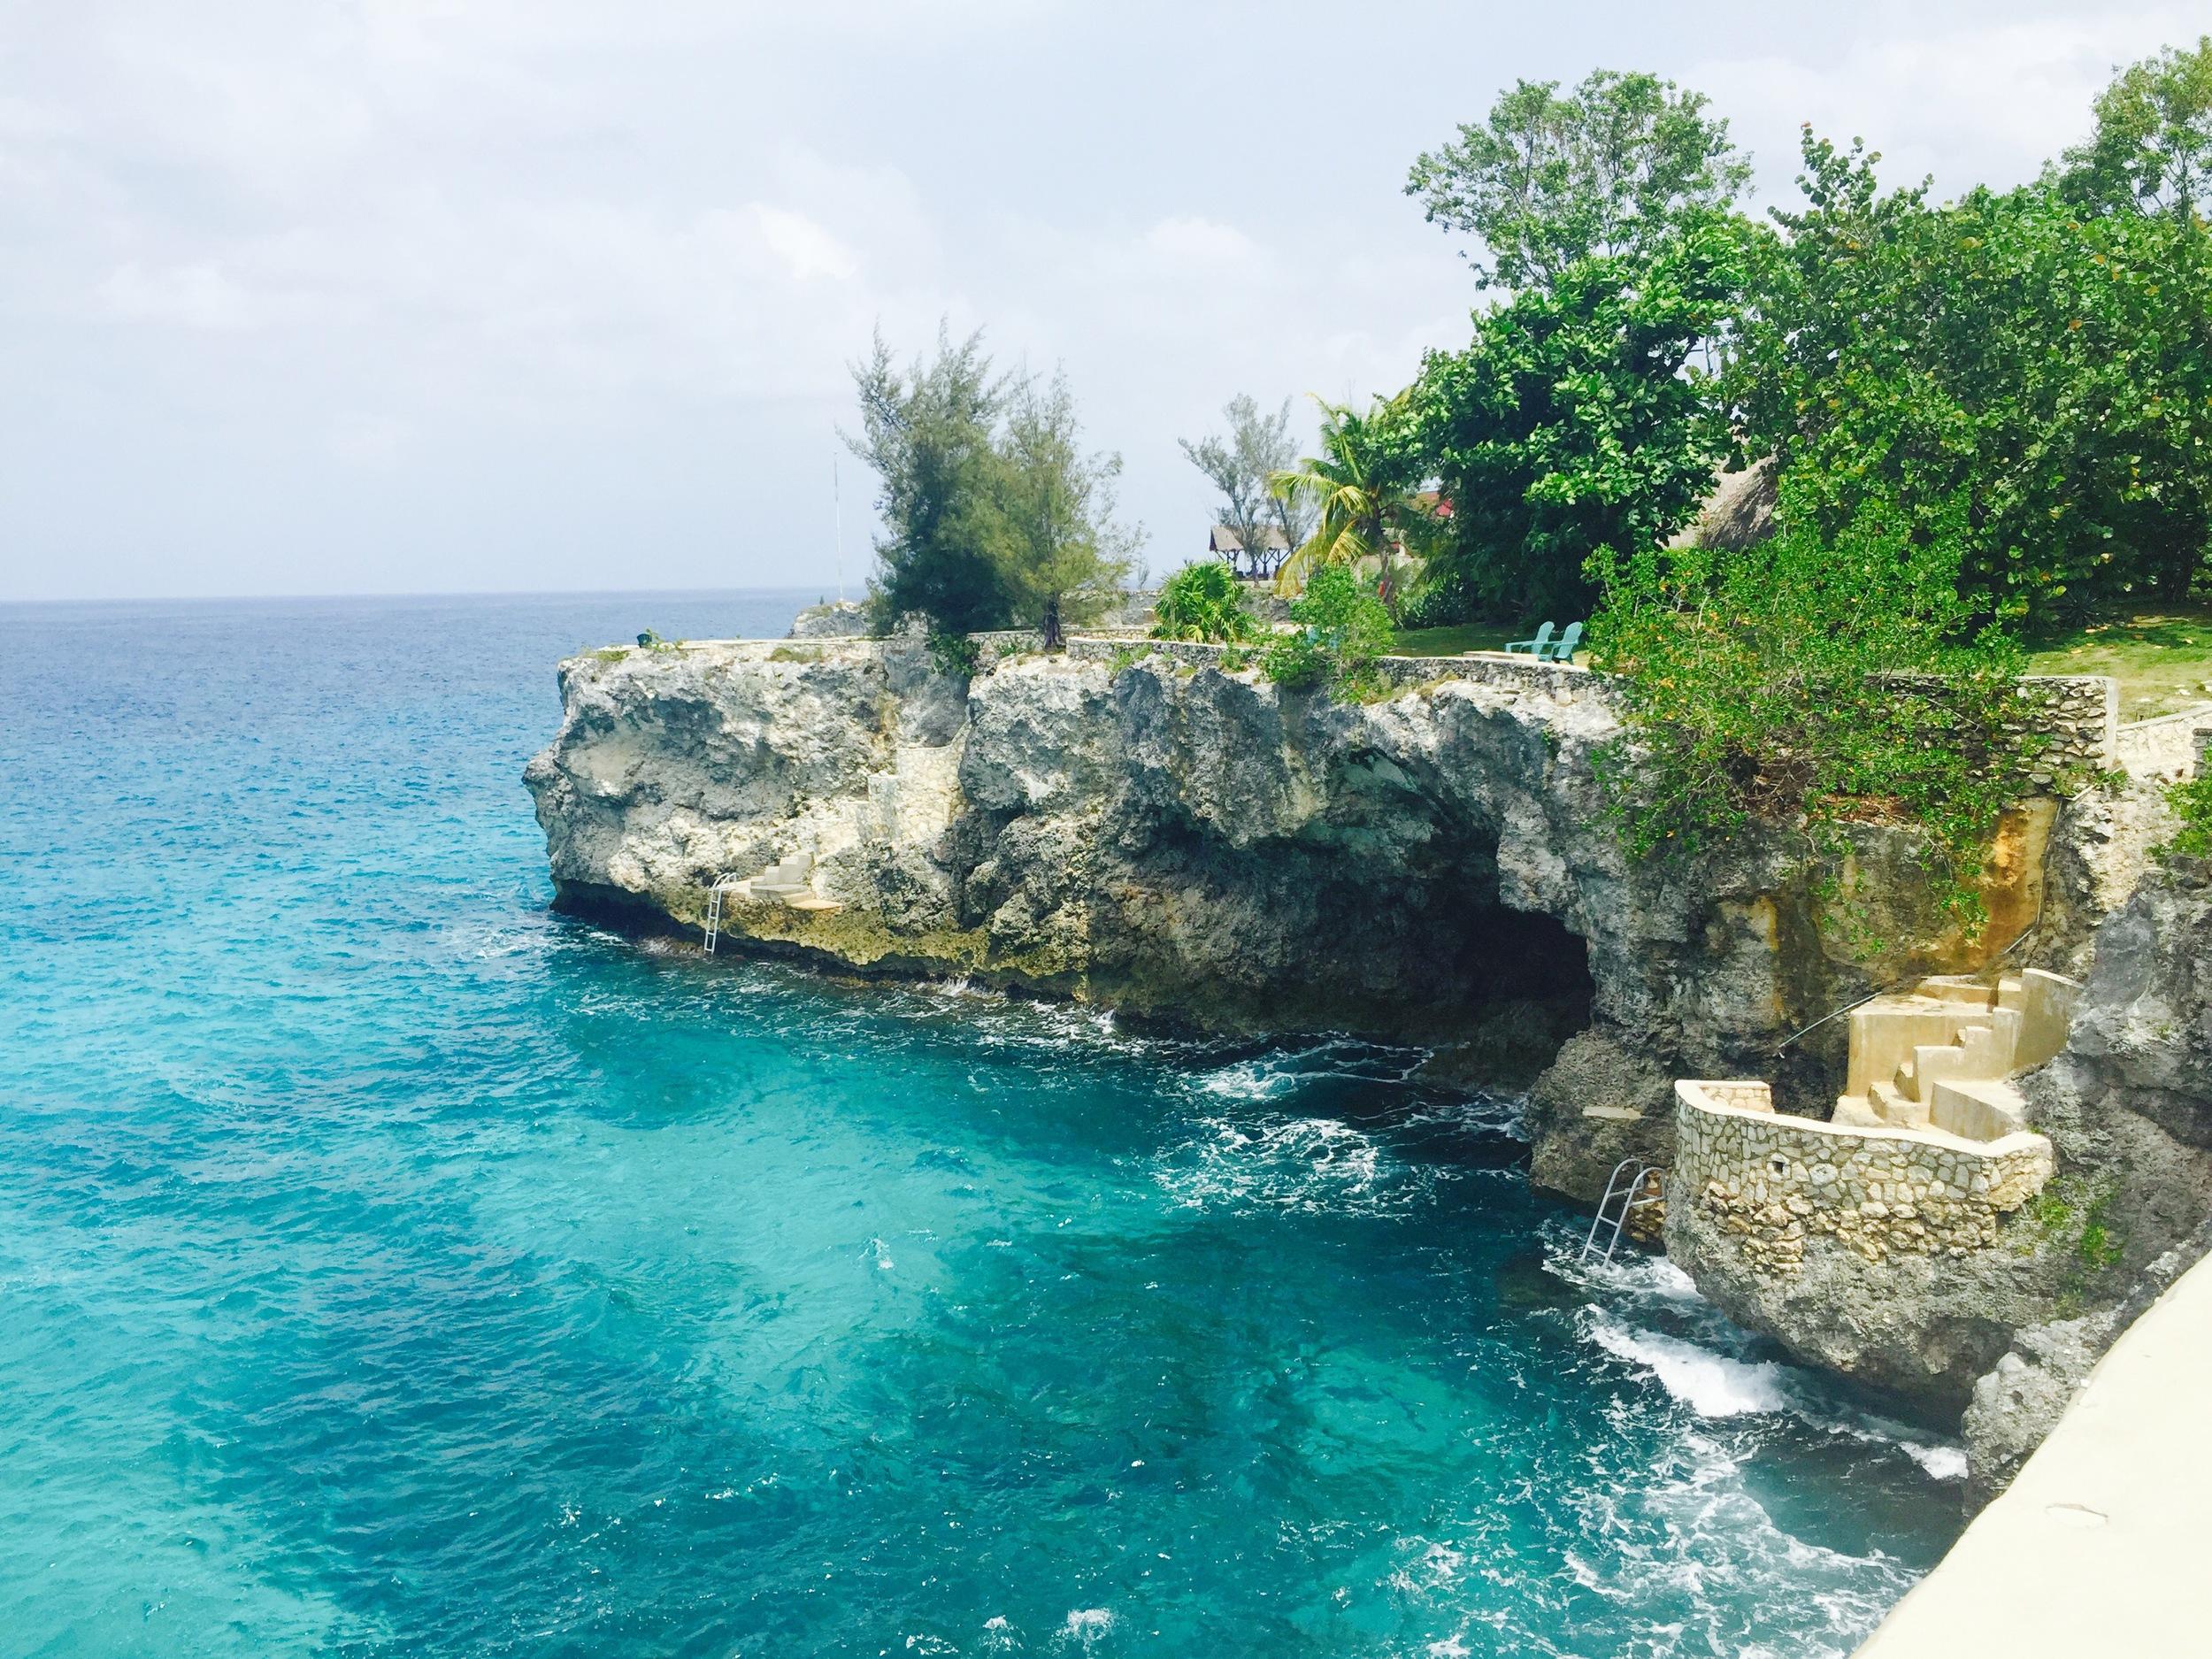 West End, Jamaica